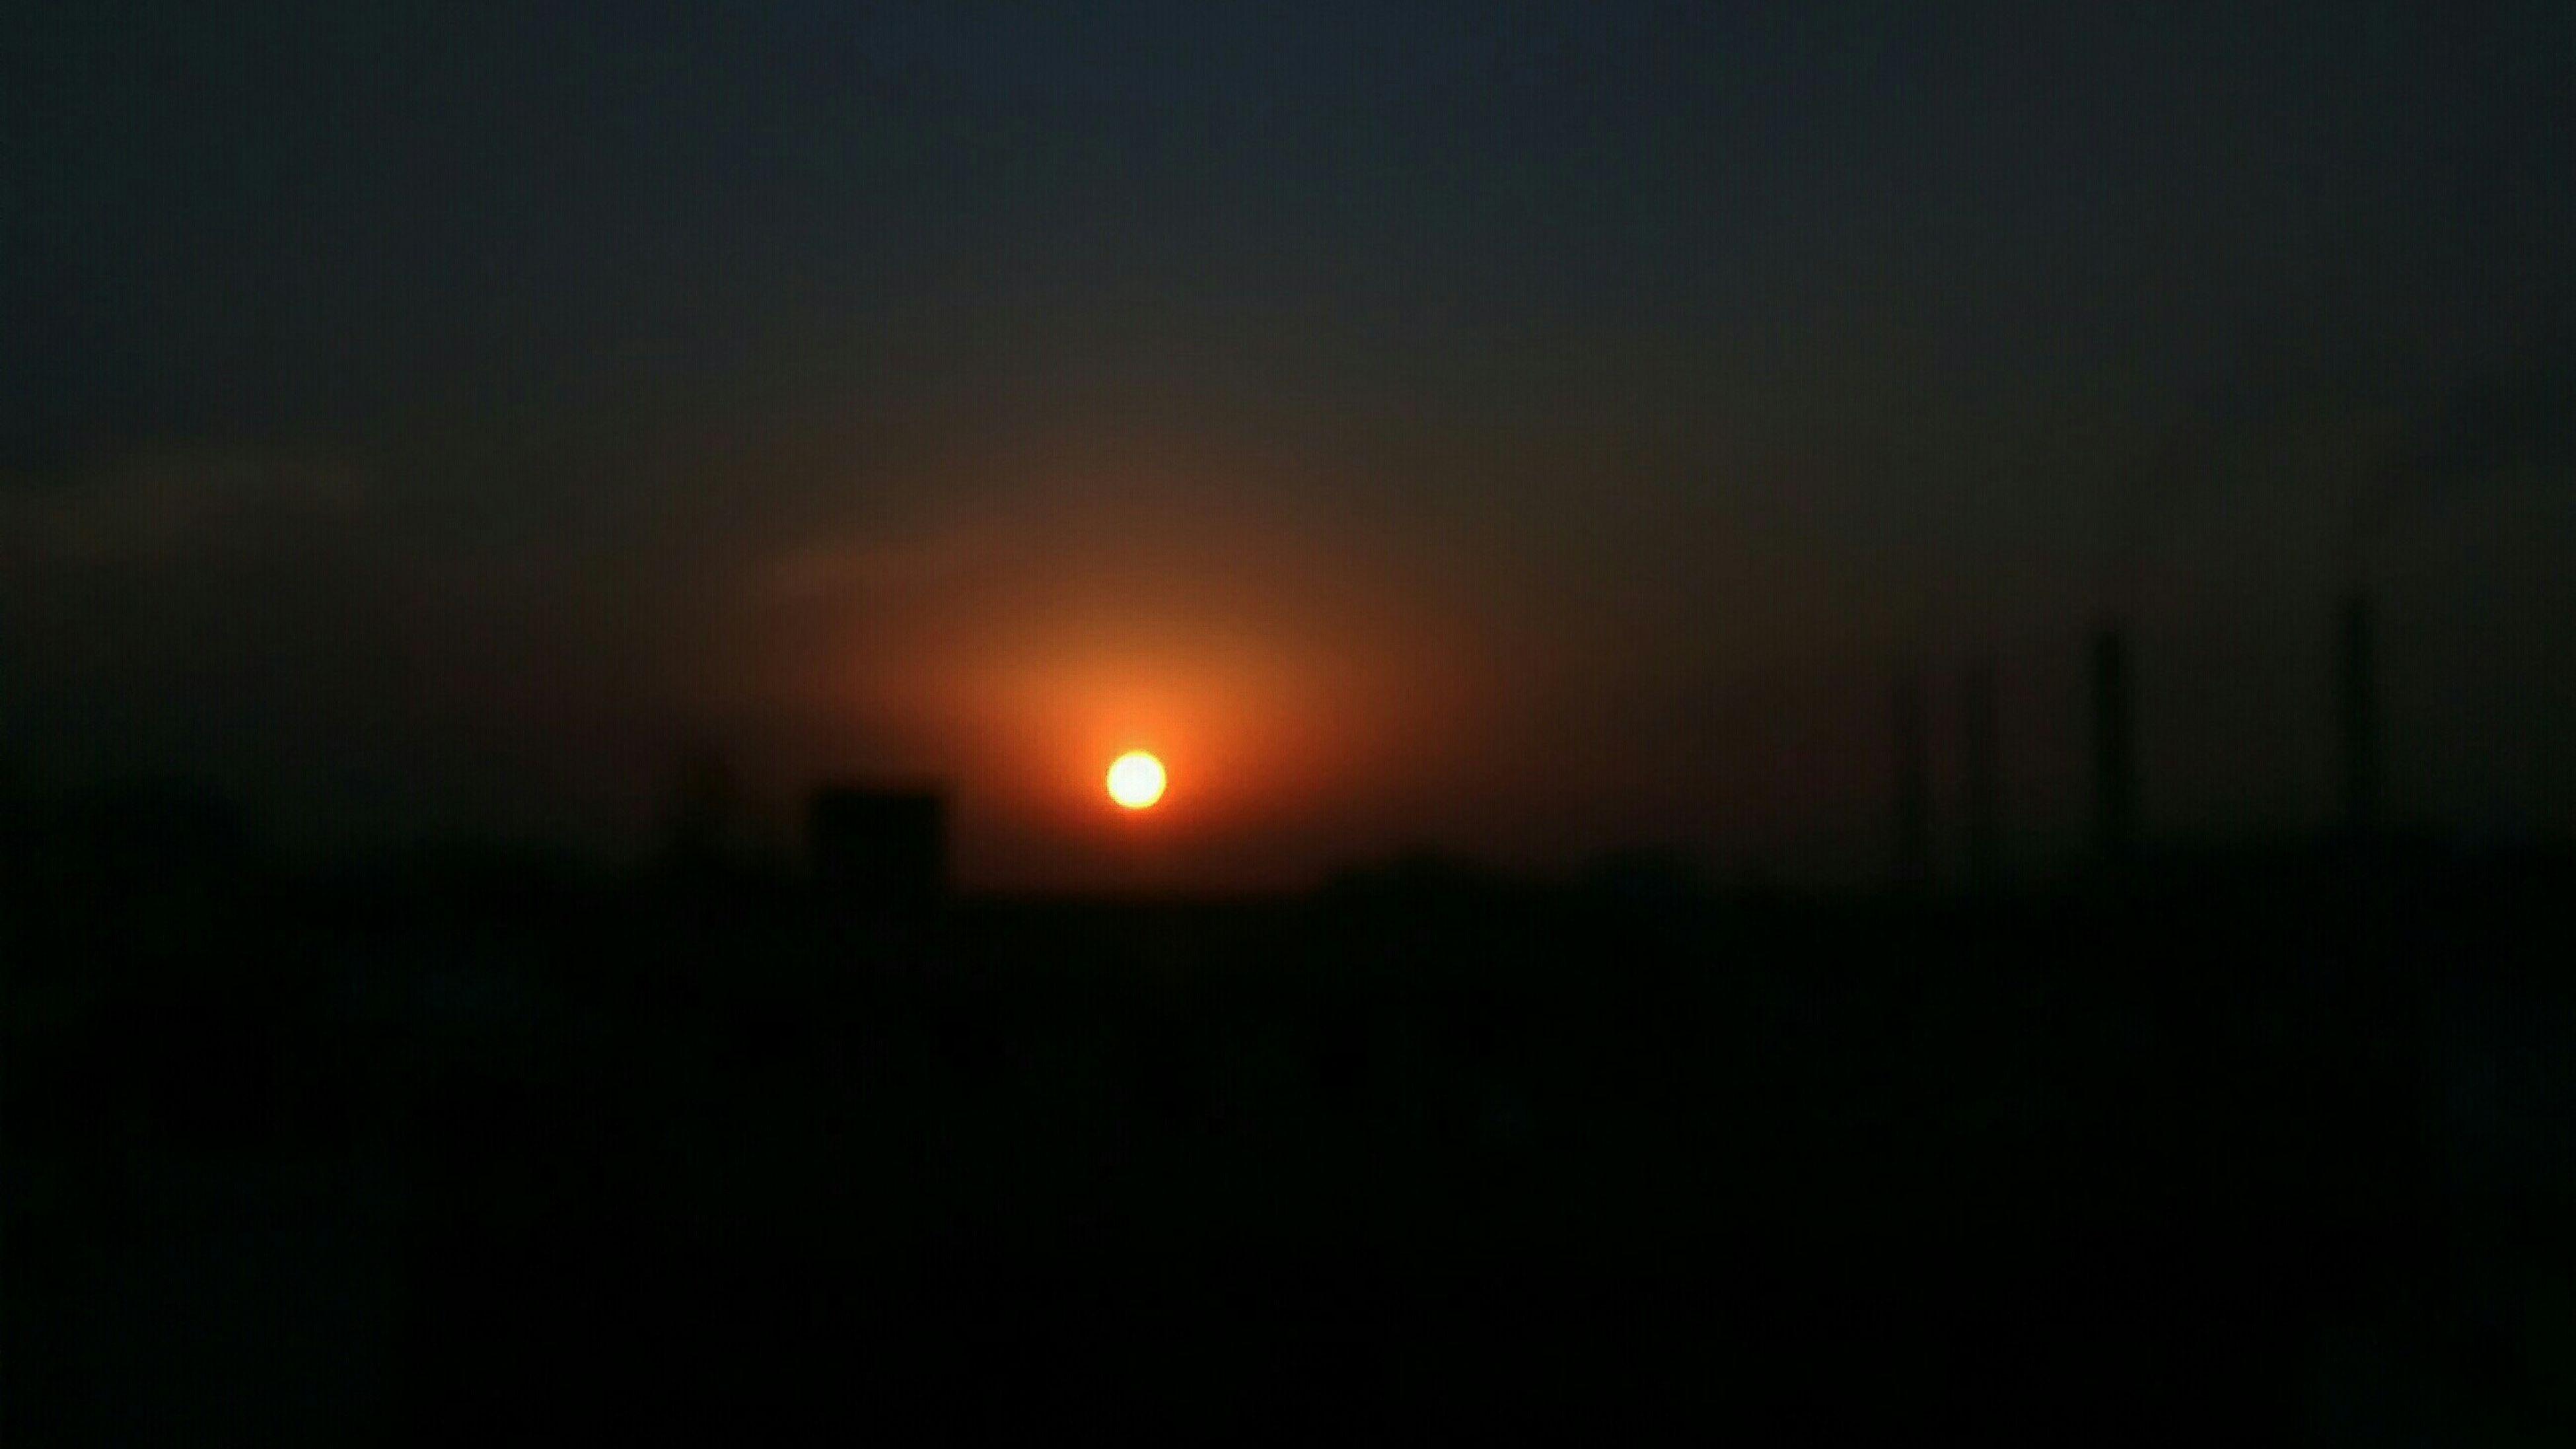 sunset, silhouette, scenics, dark, beauty in nature, copy space, tranquil scene, orange color, tranquility, sky, idyllic, nature, sun, landscape, outdoors, no people, night, majestic, dramatic sky, dusk